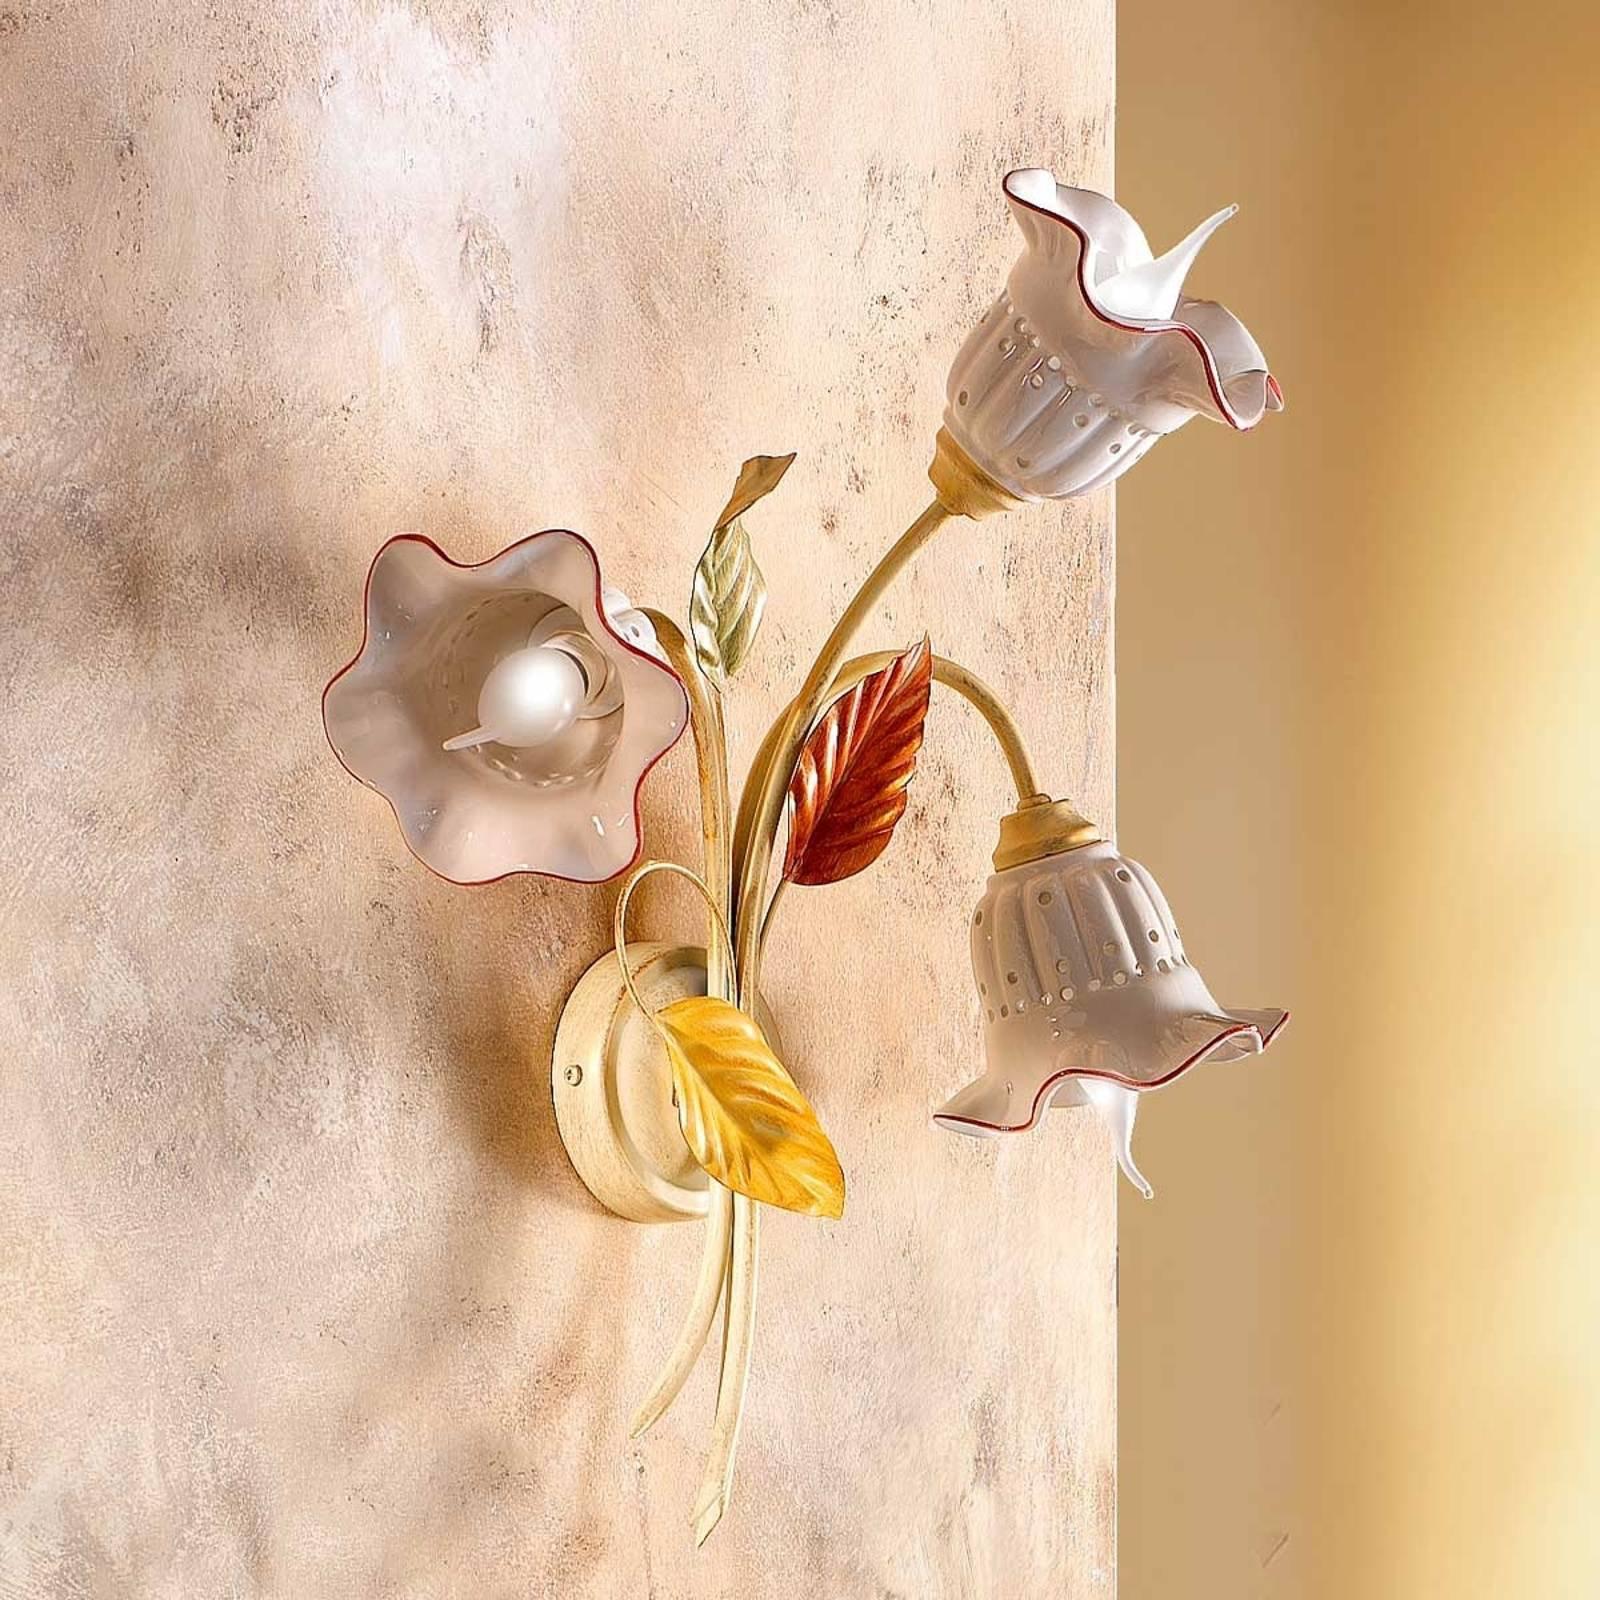 3 lyskilder vegglampe Flora i firenzestil